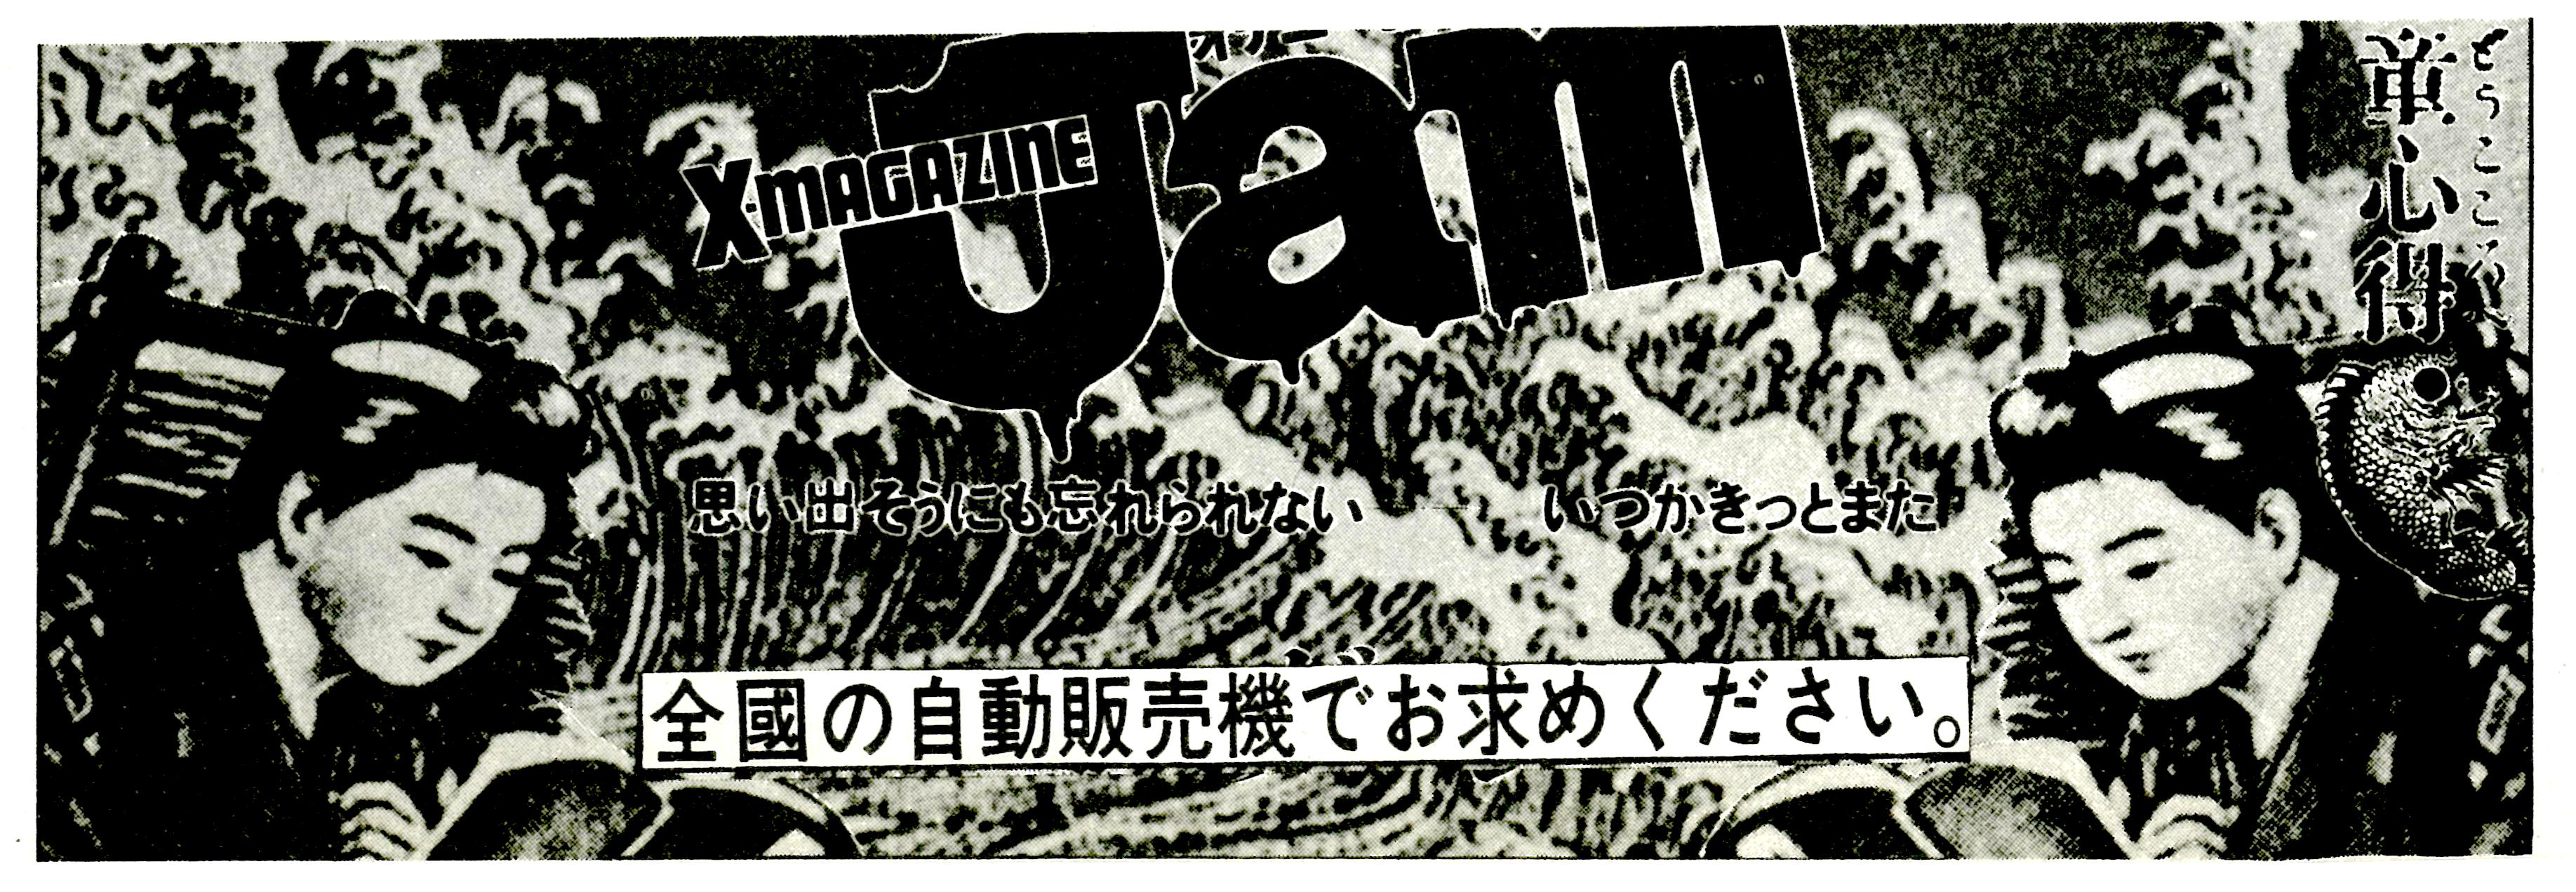 f:id:kougasetumei:20180602025253p:image